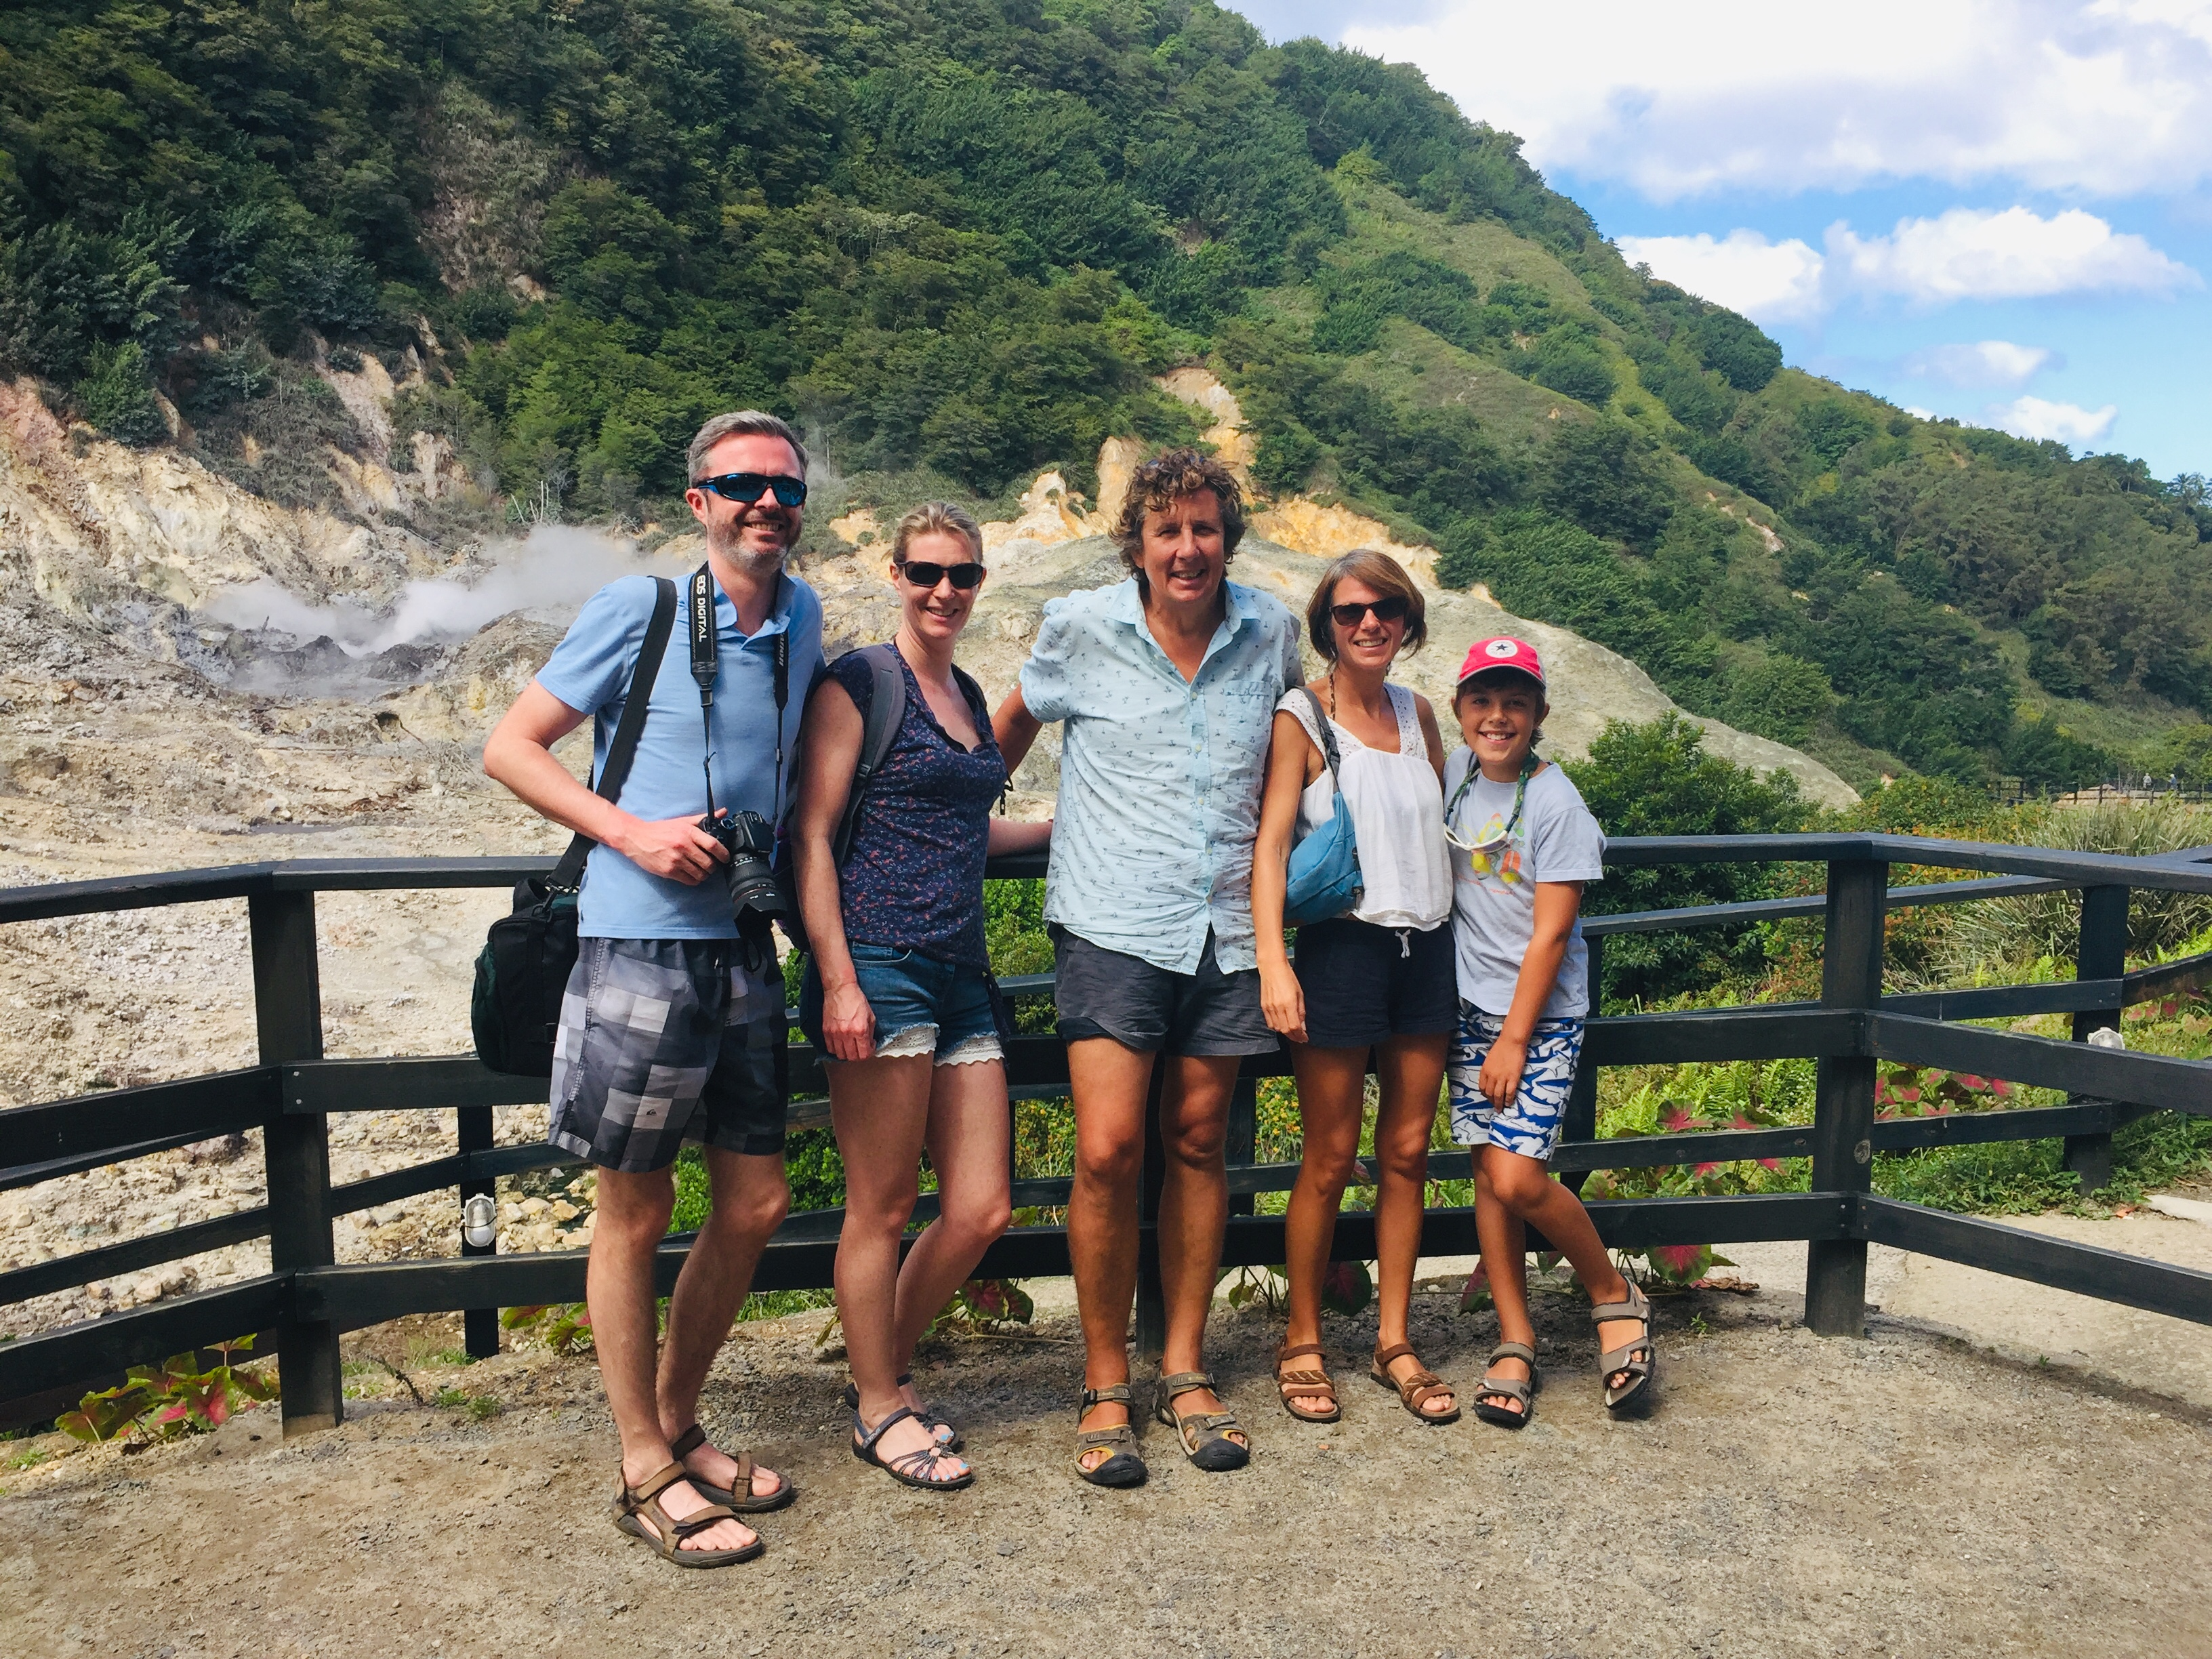 In the Caldera of the Volcano